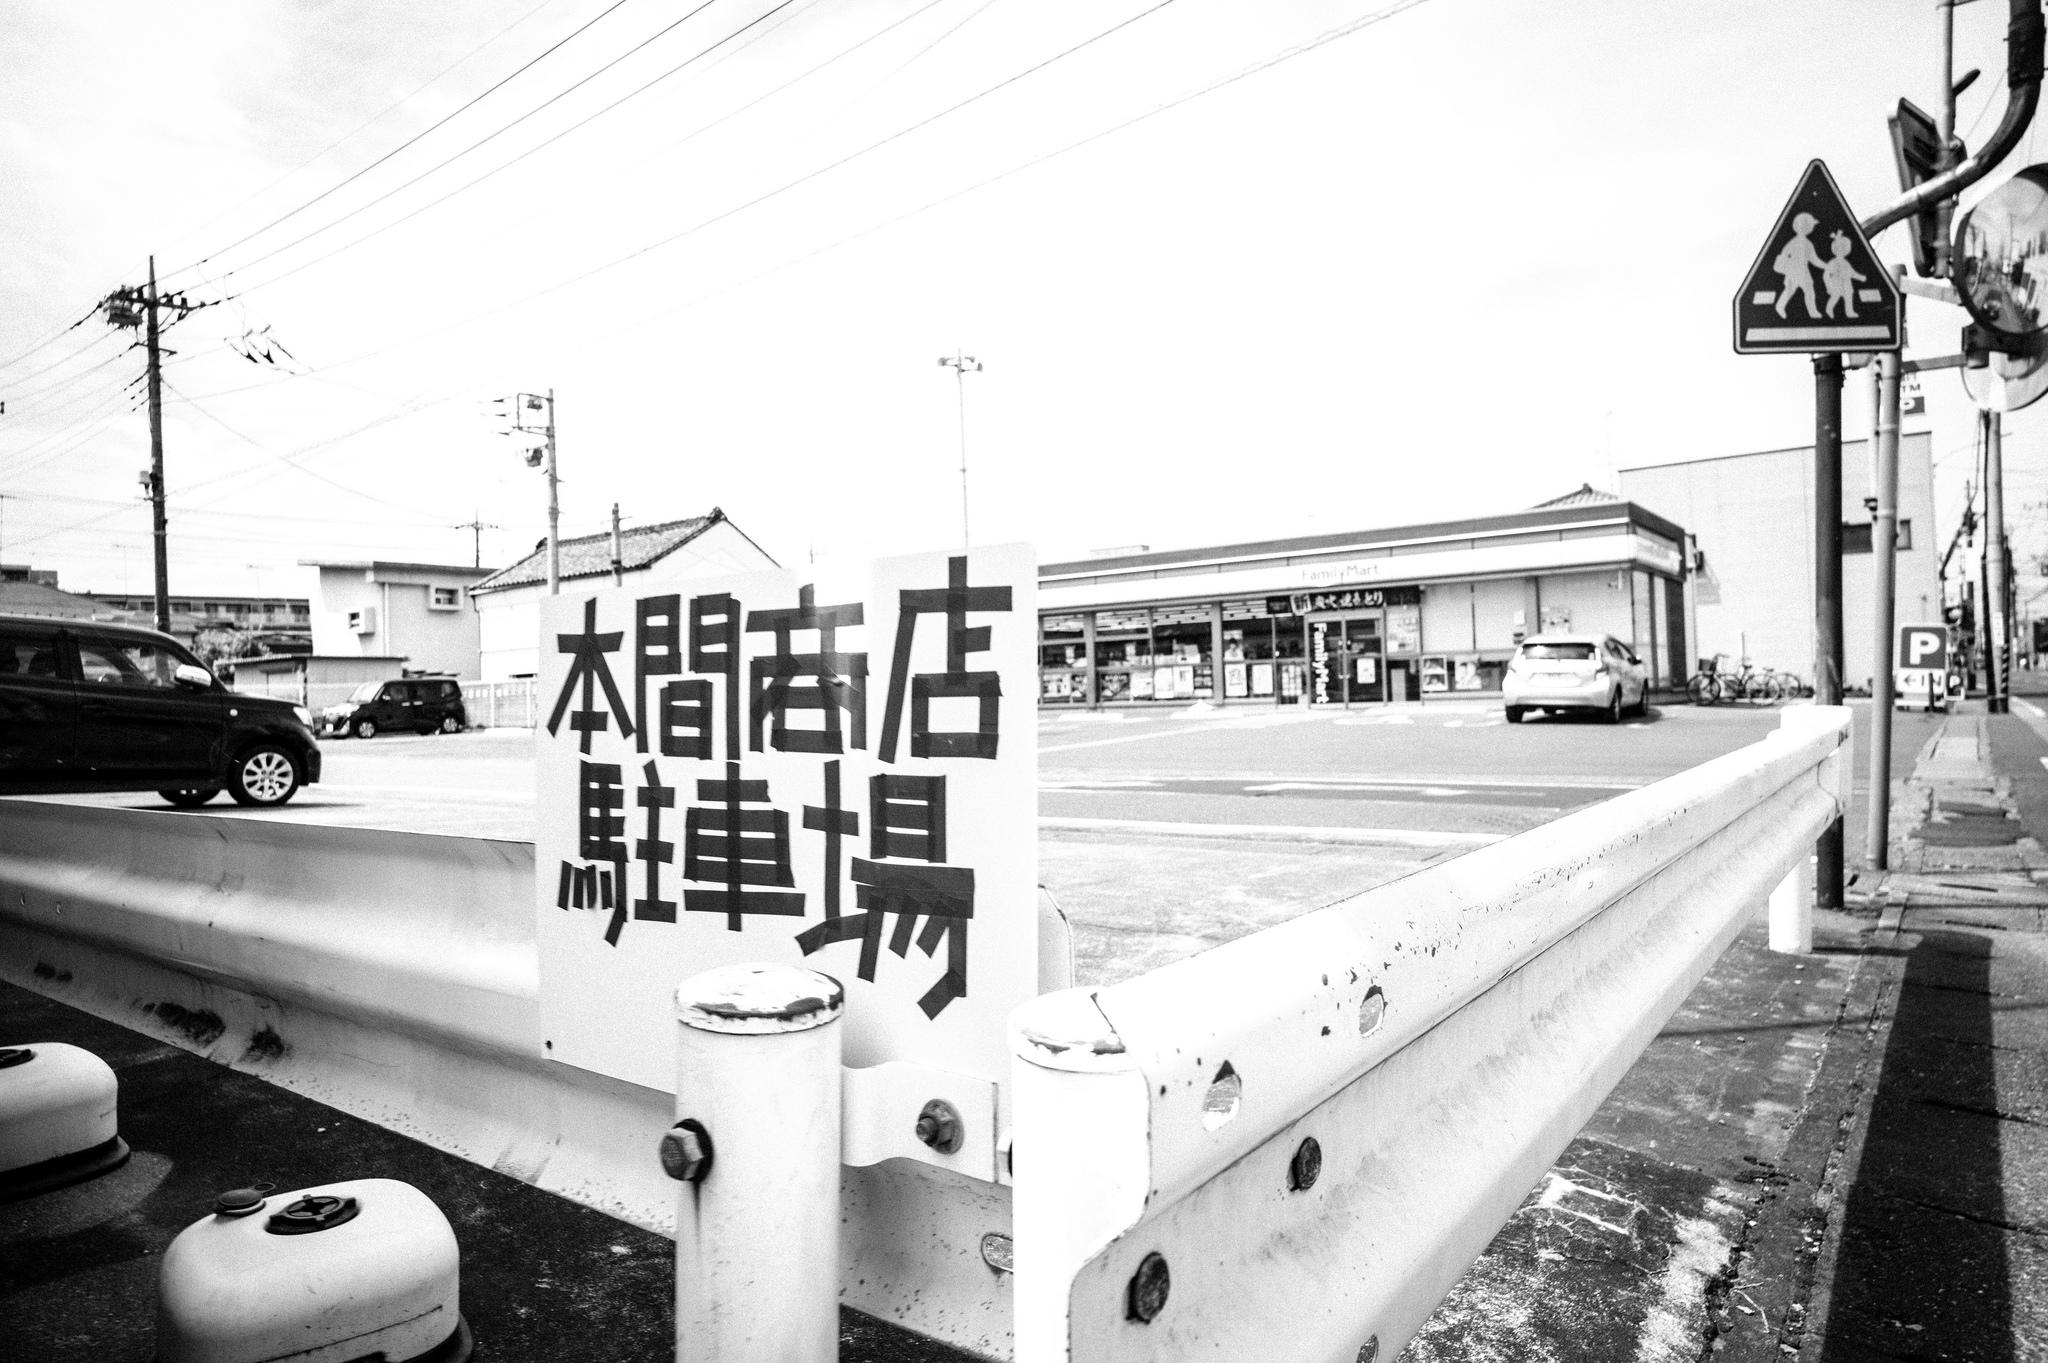 f:id:aoyama-takuro:20180830070115j:plain